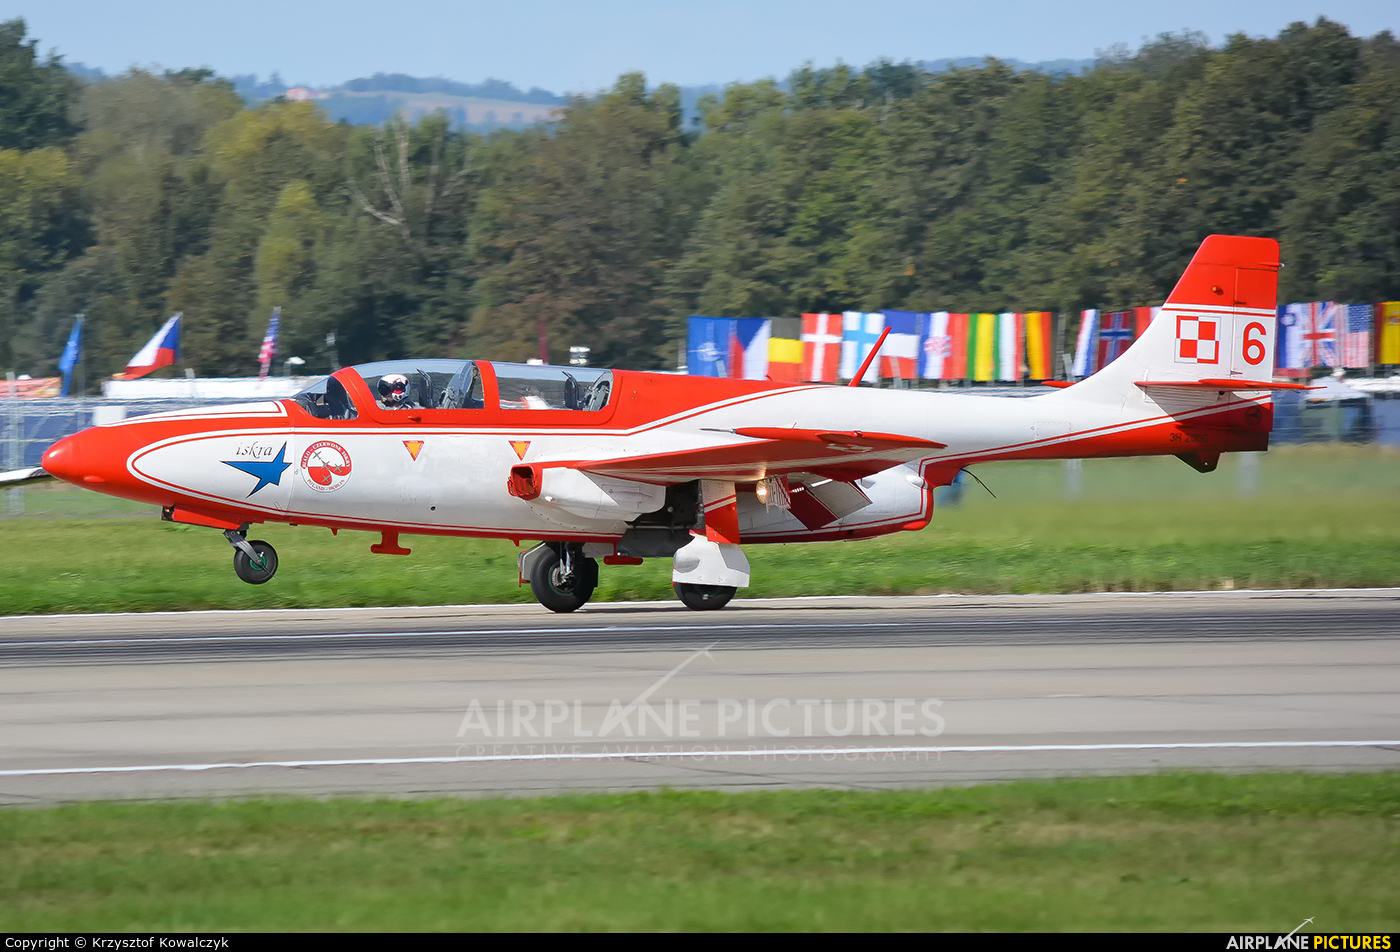 Poland - Air Force: White & Red Iskras 6 aircraft at Ostrava Mošnov